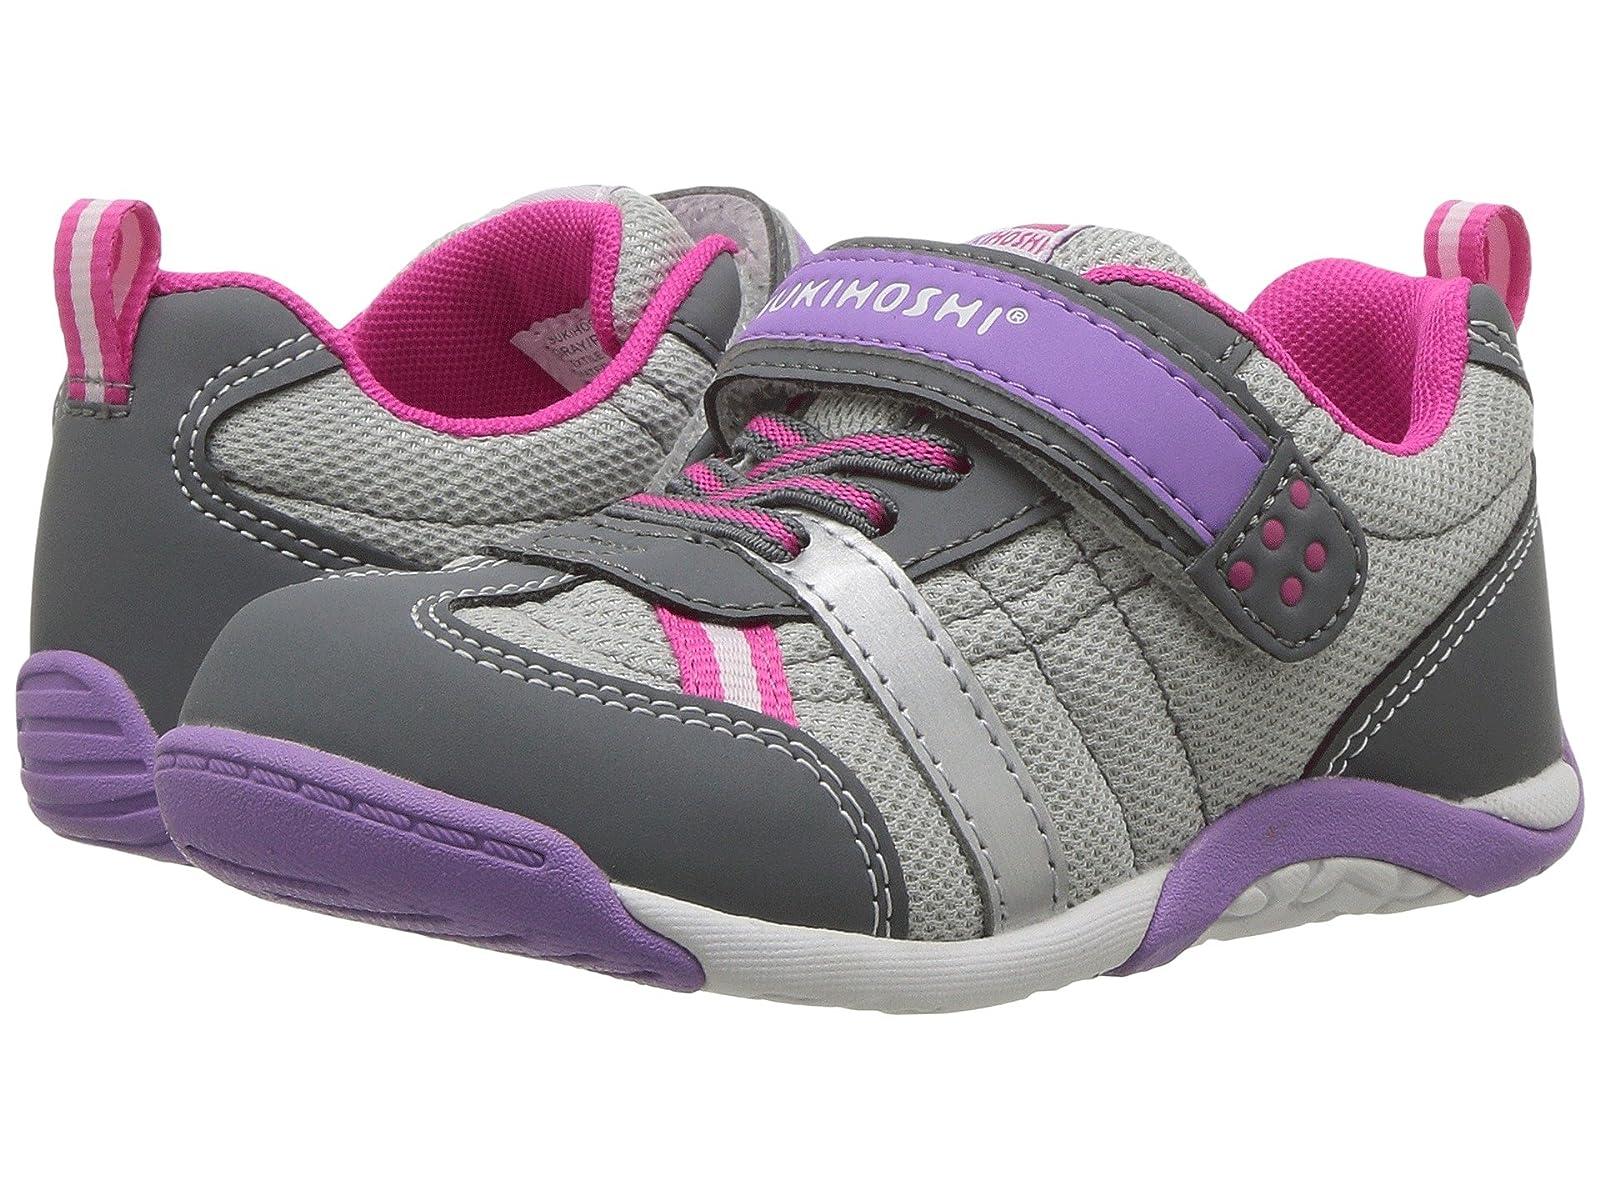 Tsukihoshi Kids Kaz (Toddler/Little Kid)Atmospheric grades have affordable shoes